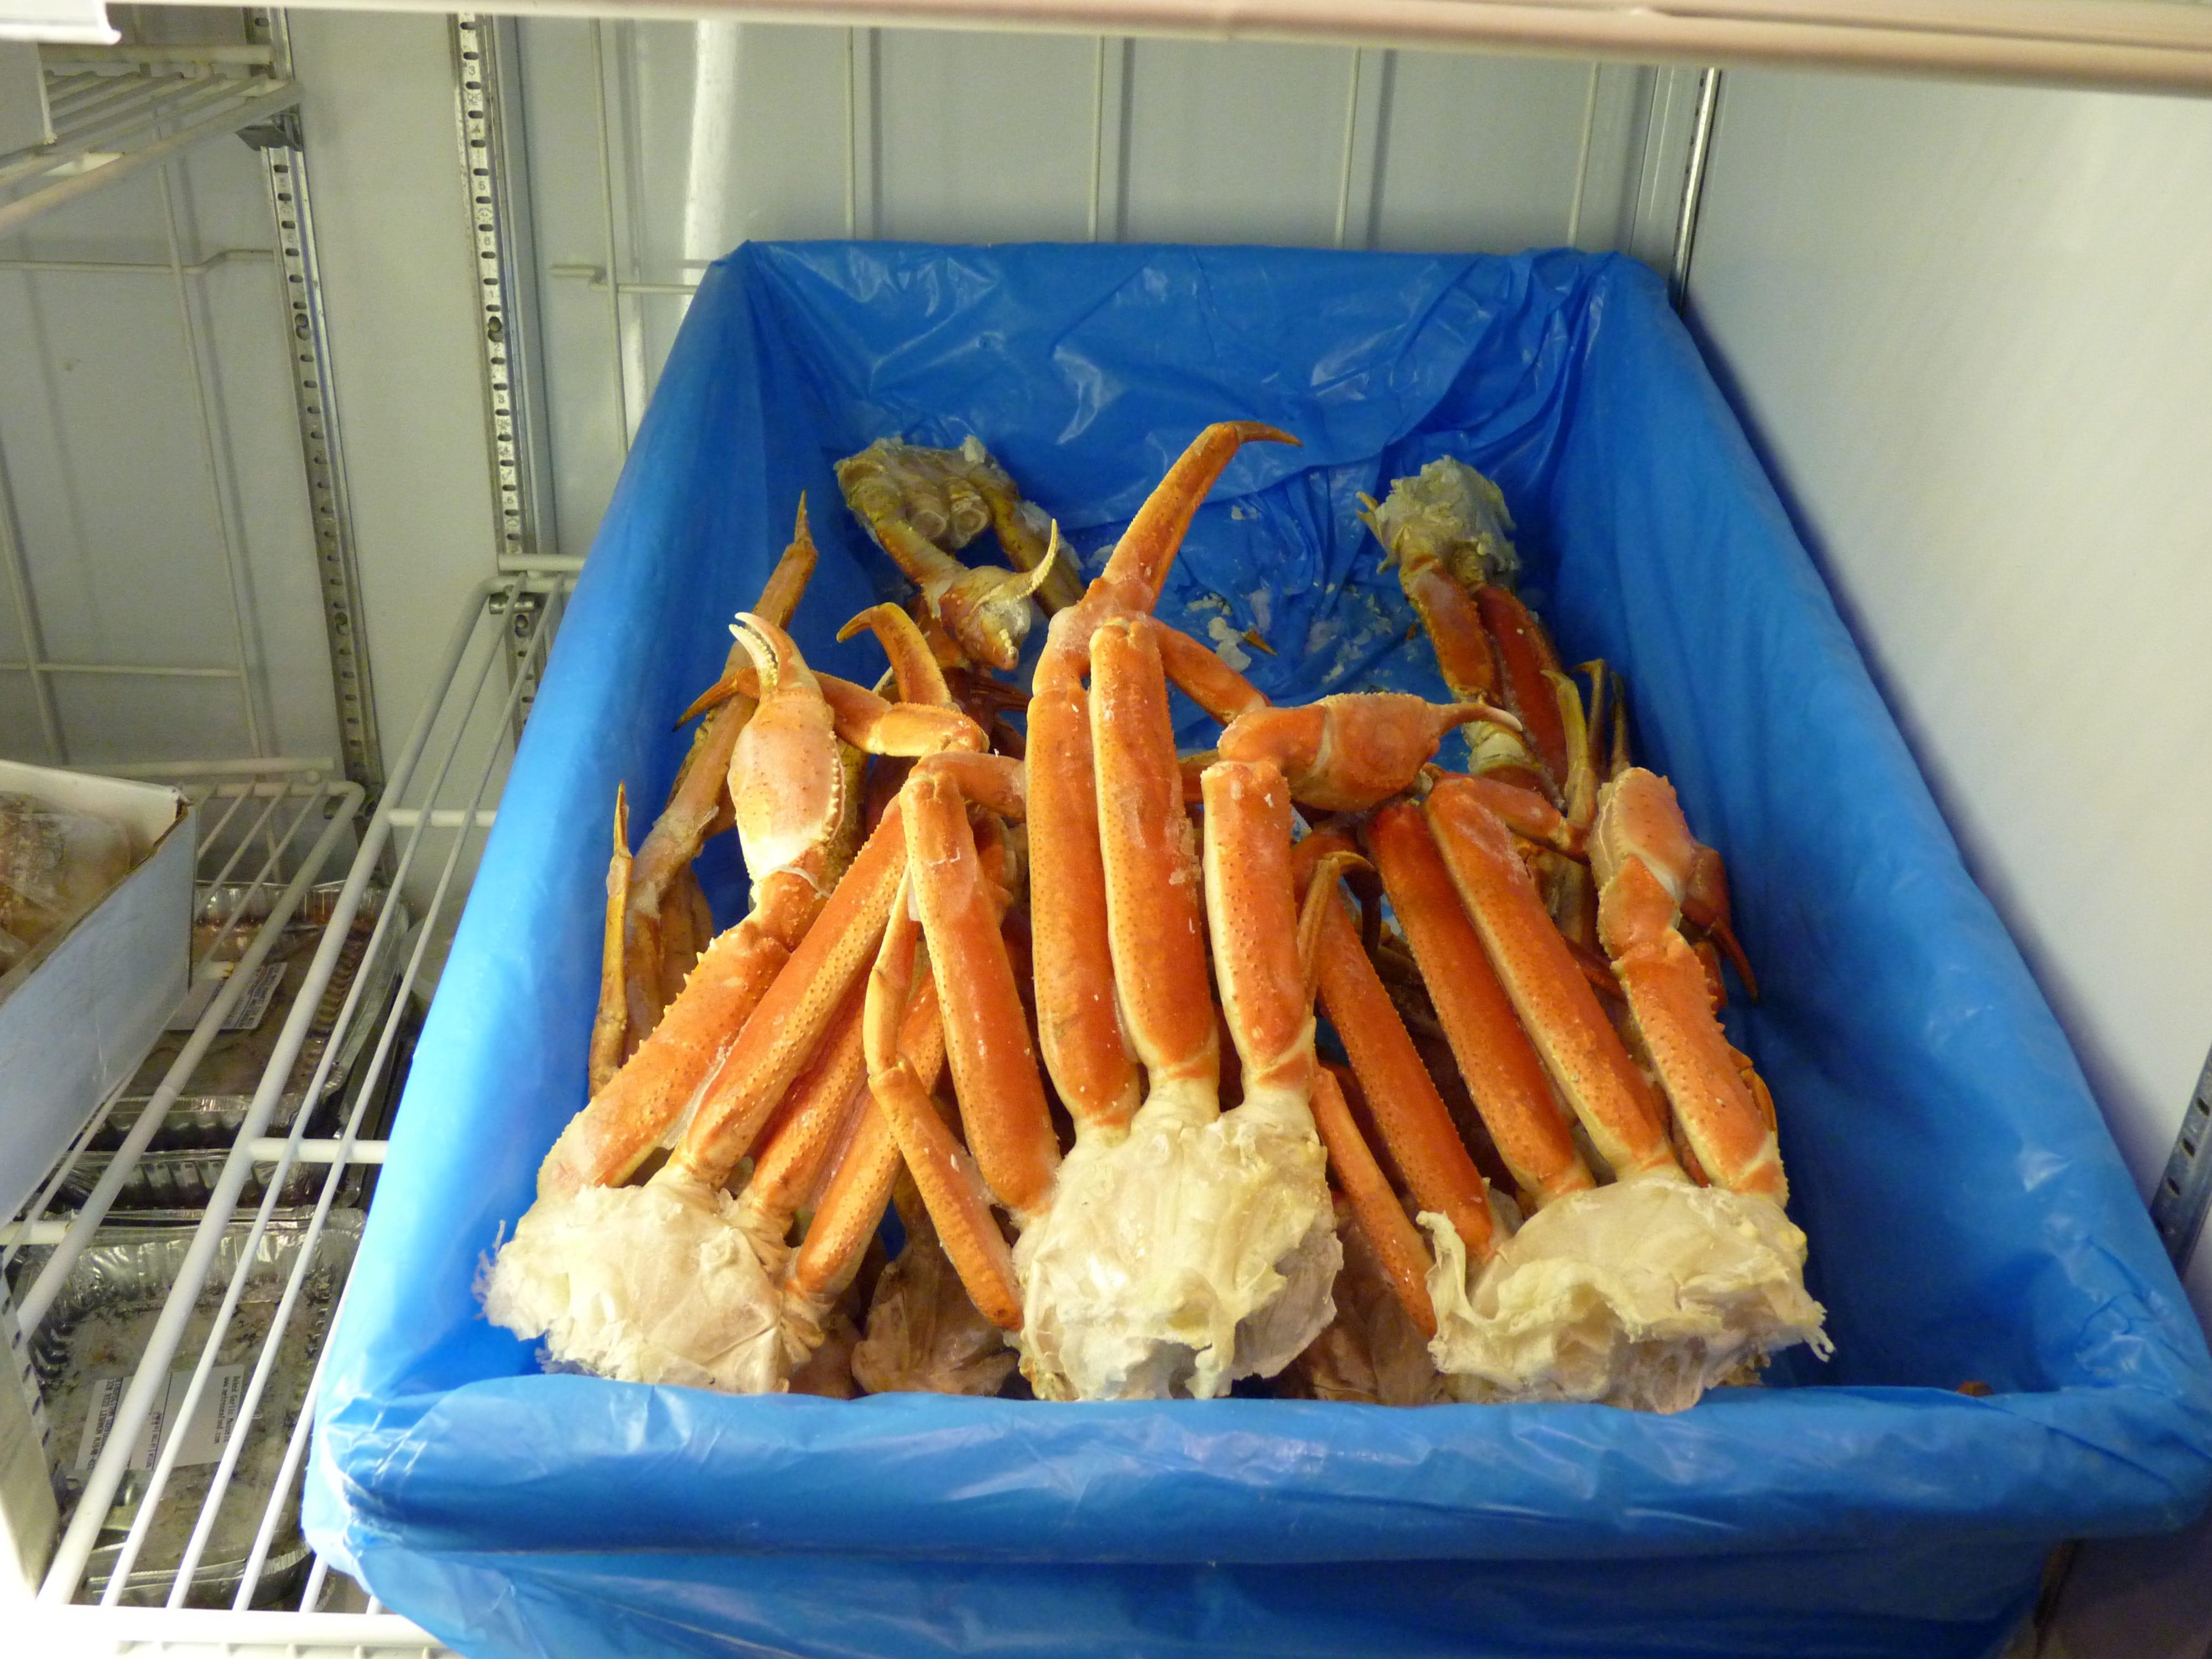 King crab legs at Metropolitan Seafood & Gourmet in Lebanon.